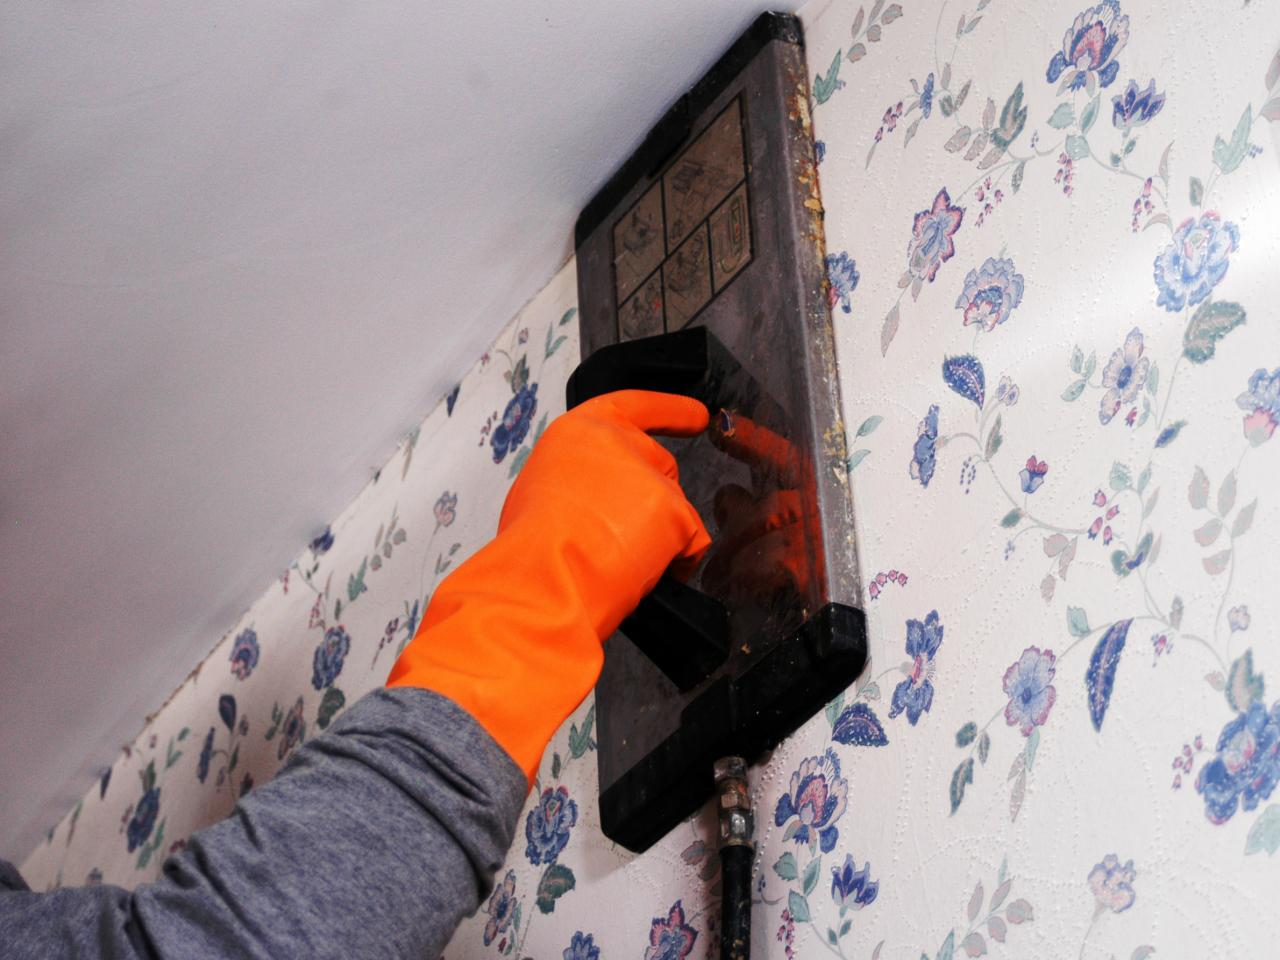 UHT Wallpaper Removal steaming wallpaper 02 s4x3jpgrendhgtvcom1280 1280x960